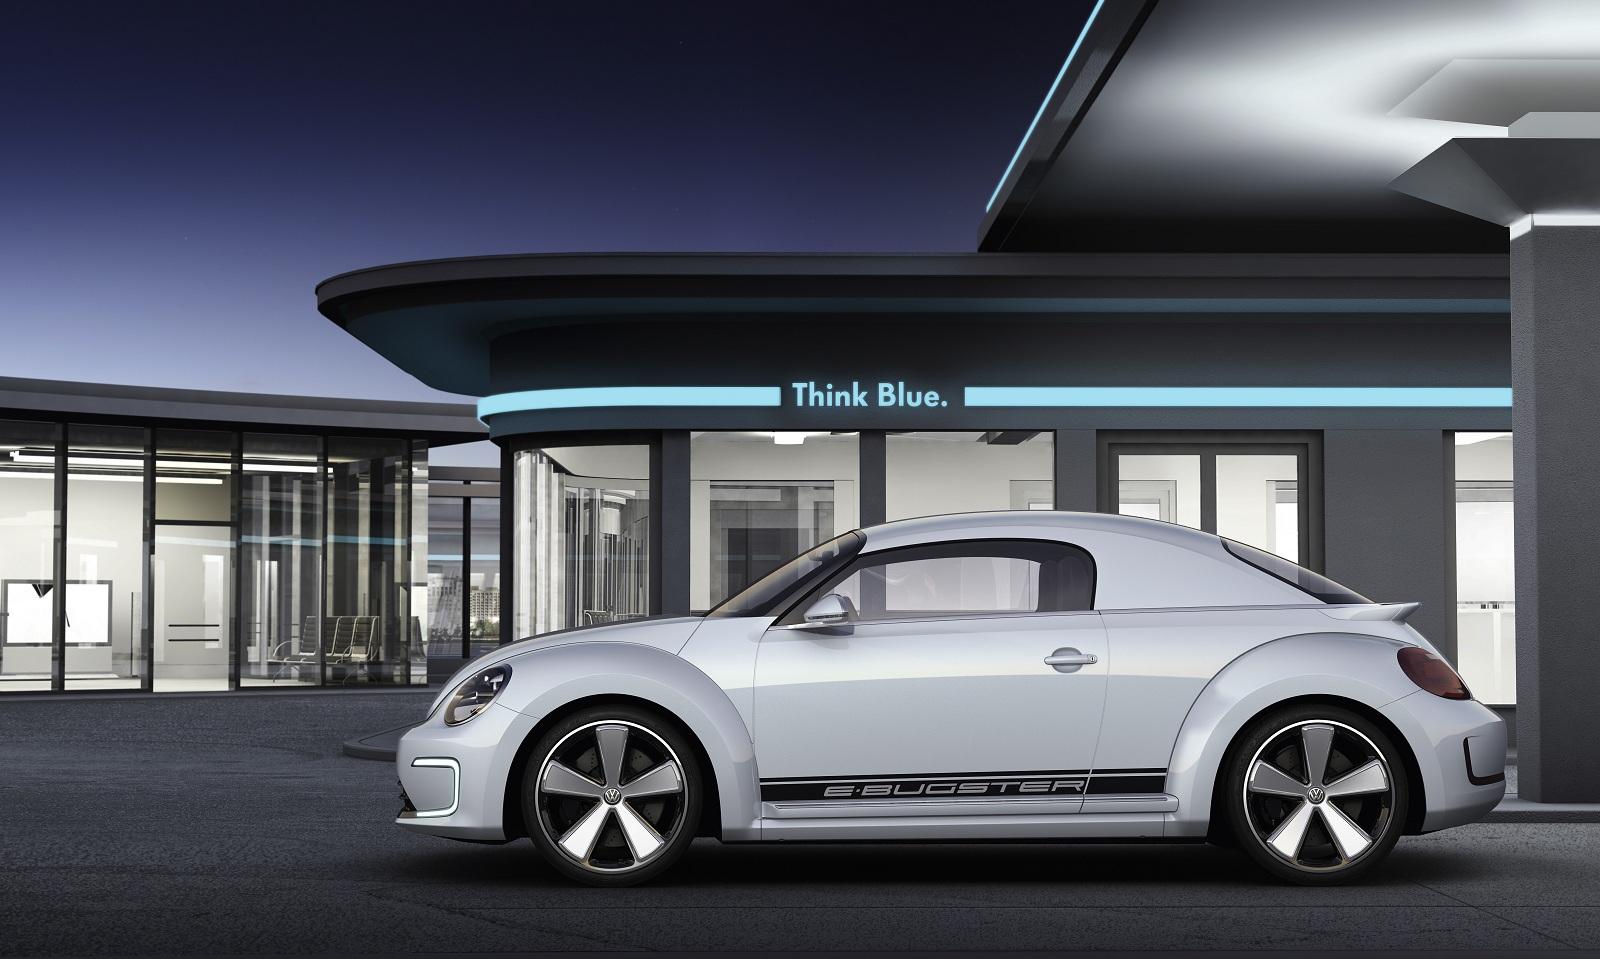 El Volkswagen  Beetle e-Bugster Concept fue otra gran idea que no se materializó